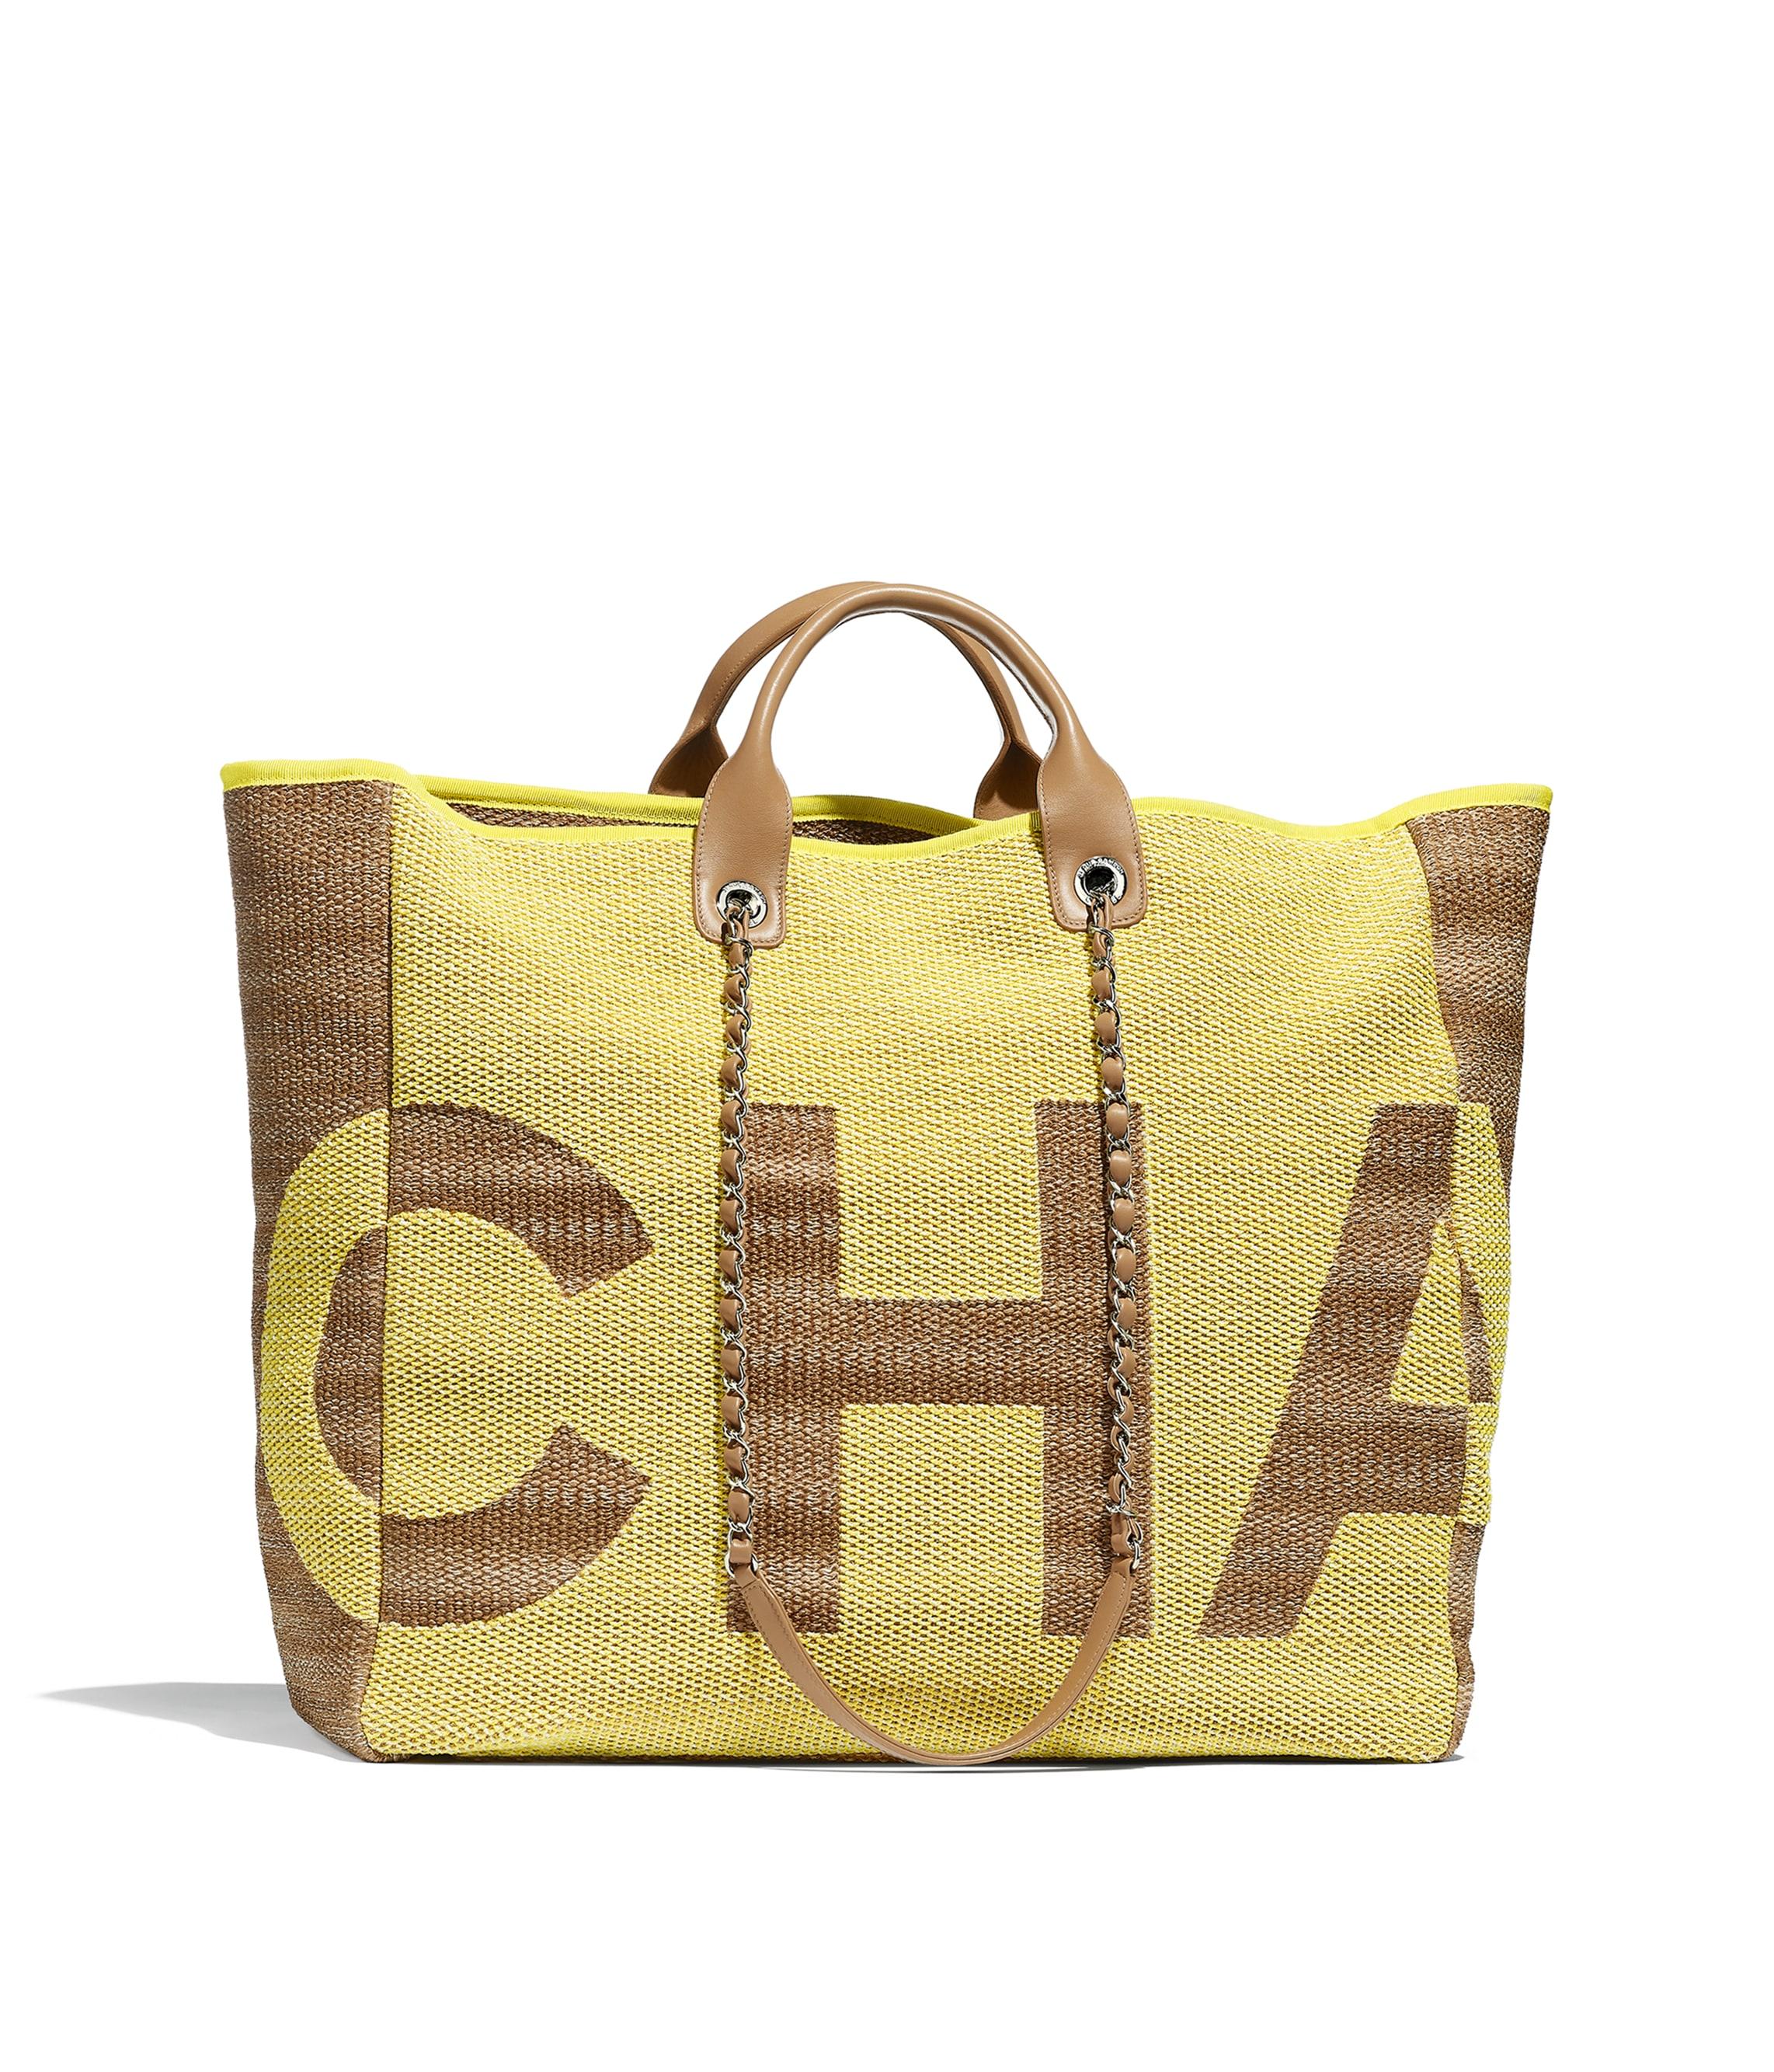 306dc309711a Tote Bags - Handbags - CHANEL